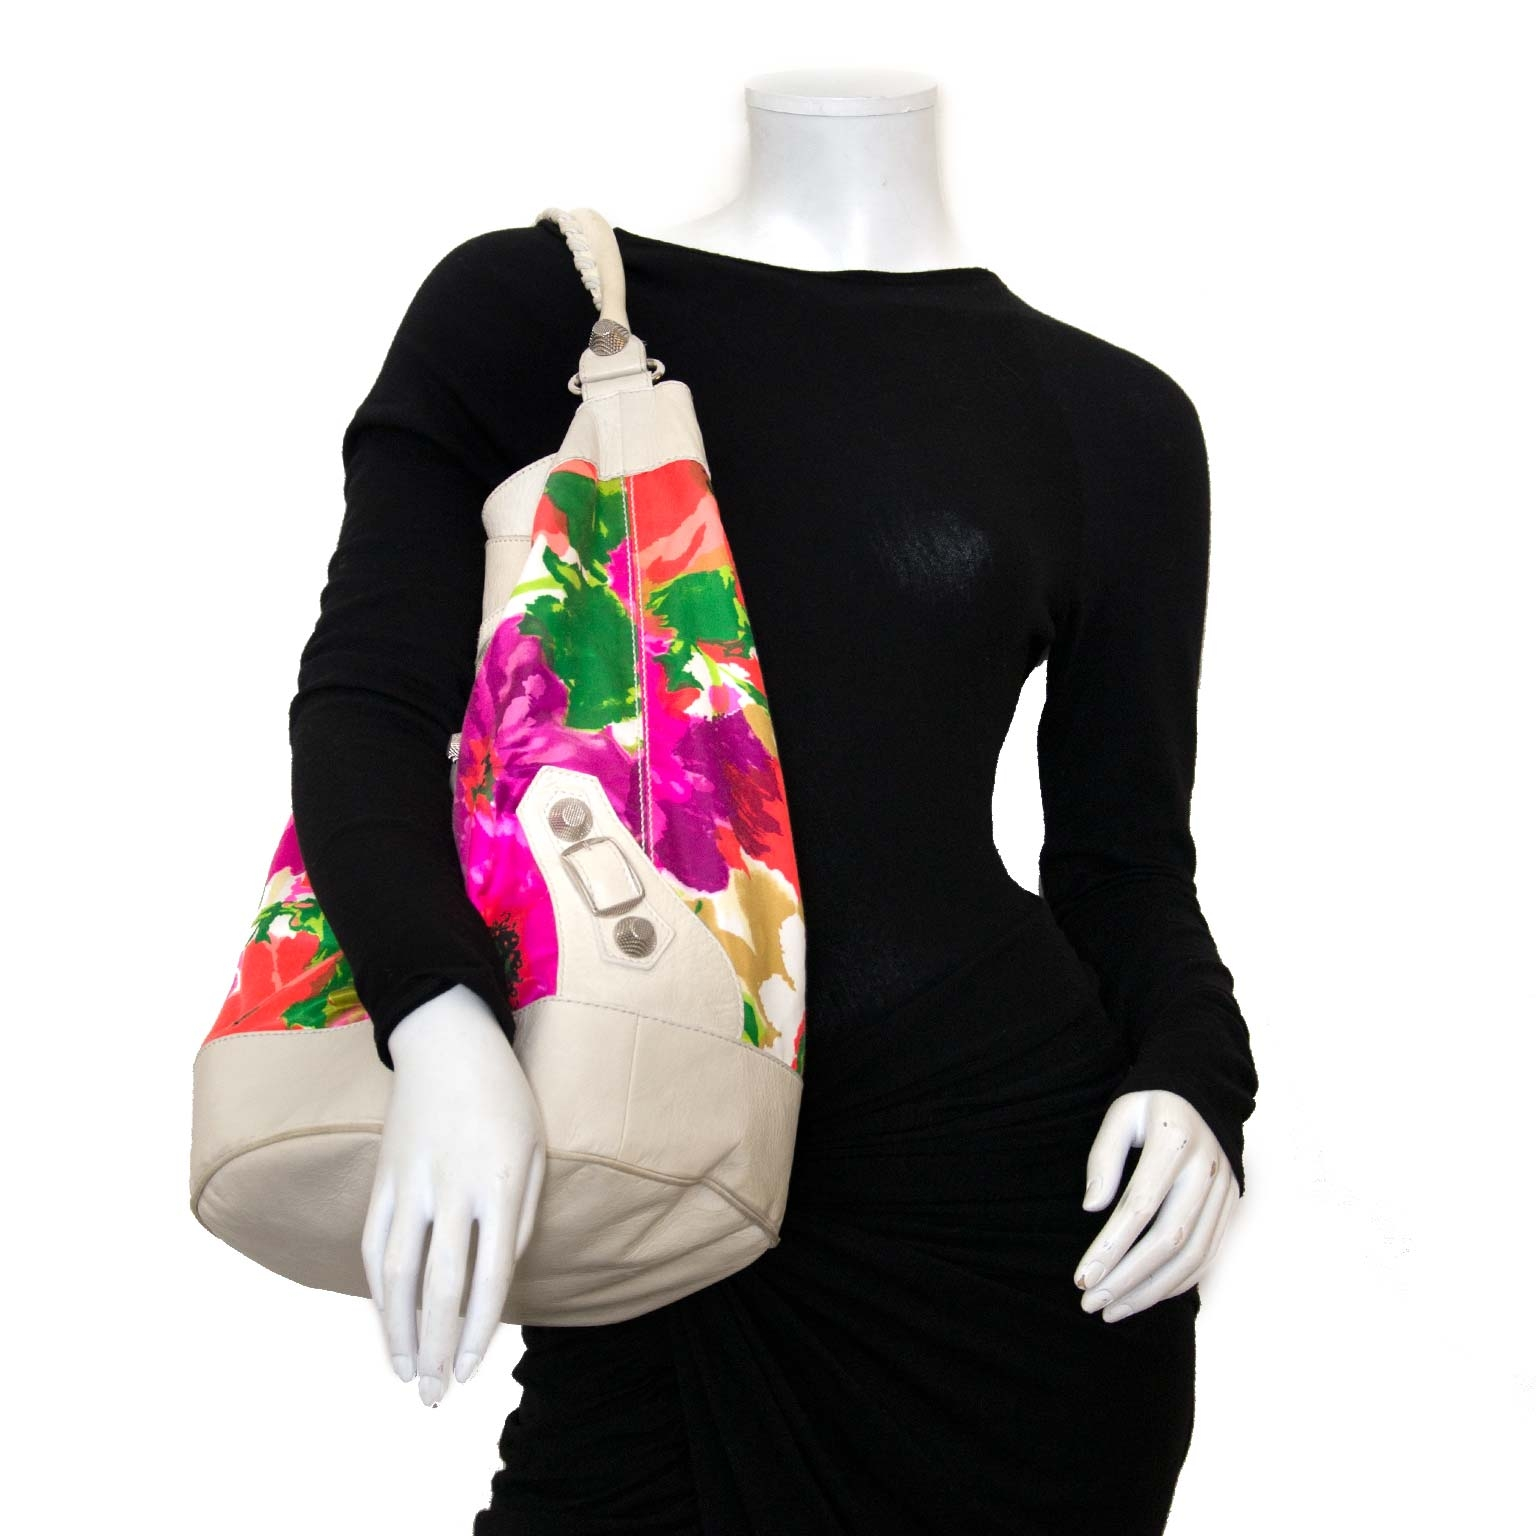 Koop authentieke tweedehands Balenciaga city bucket tassen bij labellov vintage mode webshop